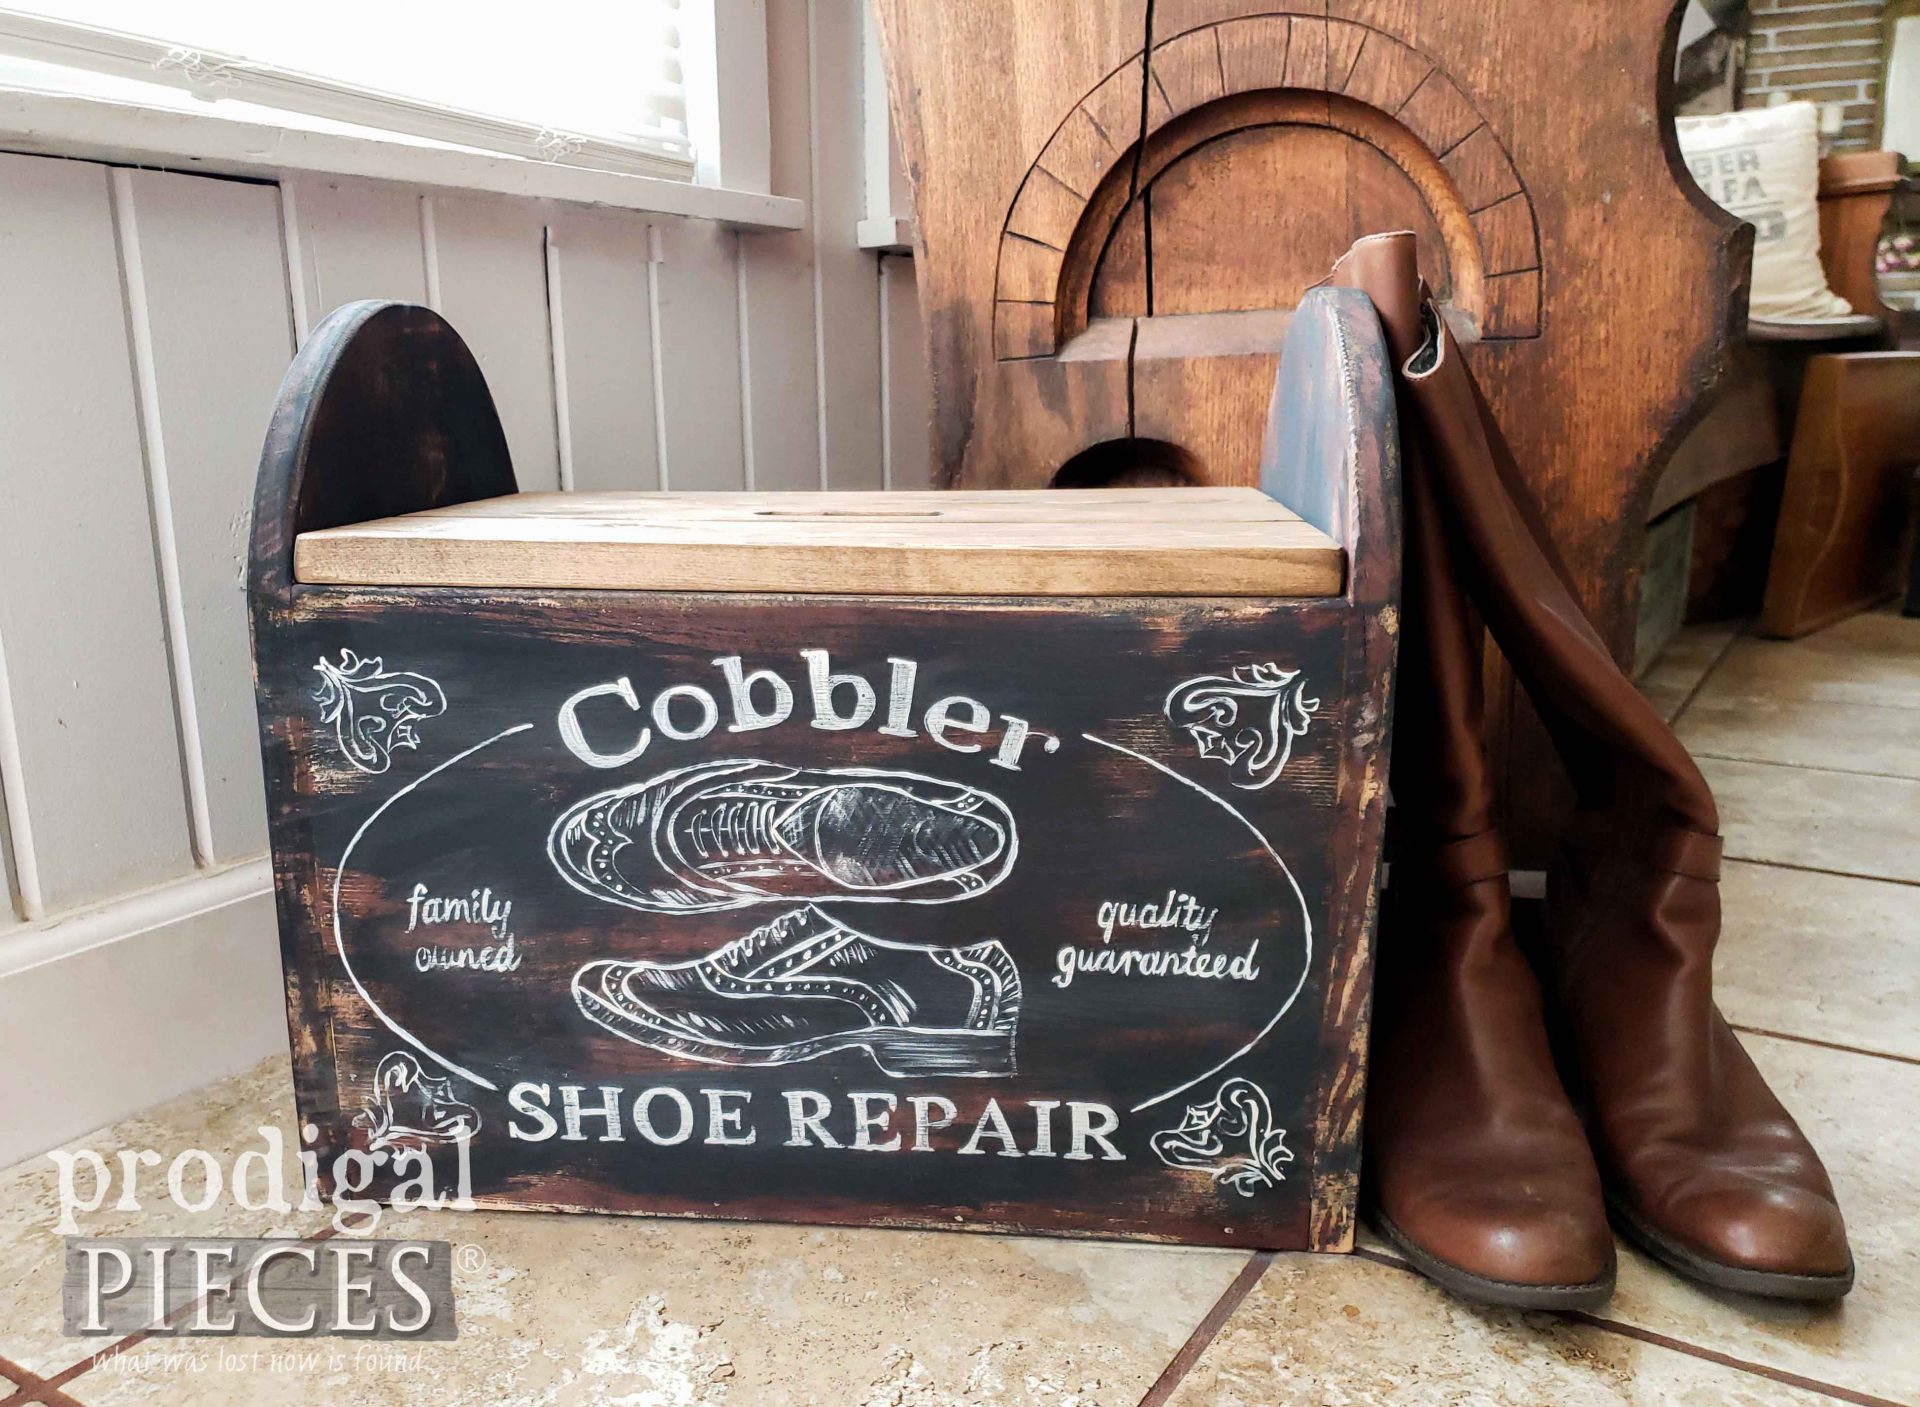 Farmhouse Cobbler Bin DIY Decor with Handmade Cobbler Bin by Larissa of Prodigal Pieces | prodigalpieces.com #prodigalpieces #farmhouse #rustic #handmade #home #homedecor